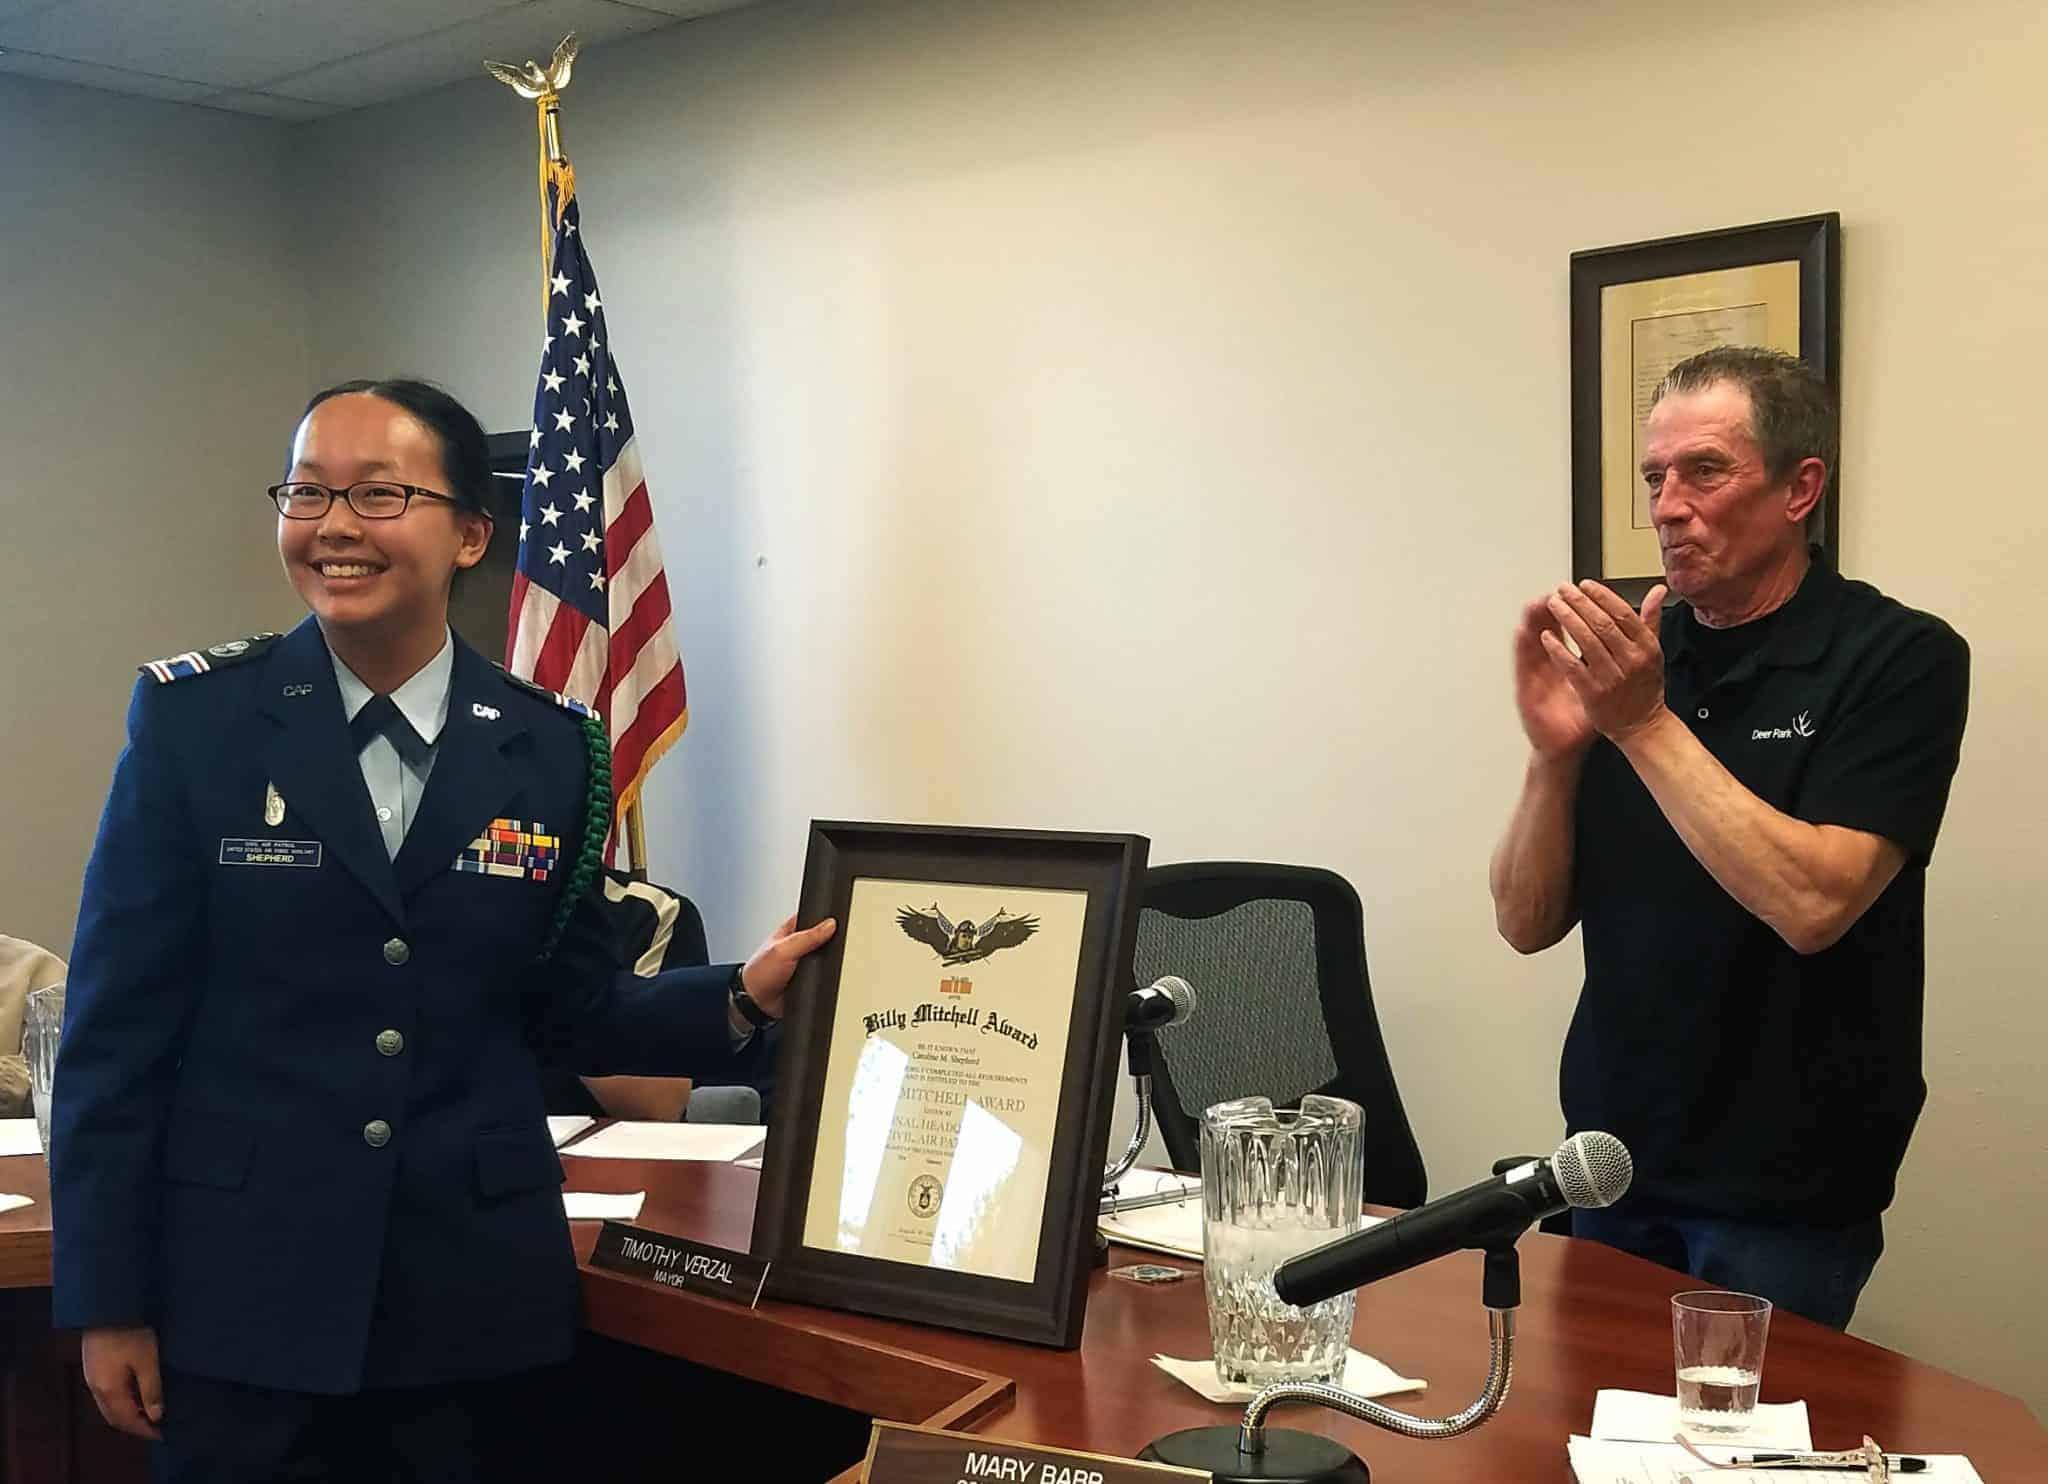 Caroline Shepherd receives major award from Mayor Tim Verzal for her work in the Civil Air Patrol